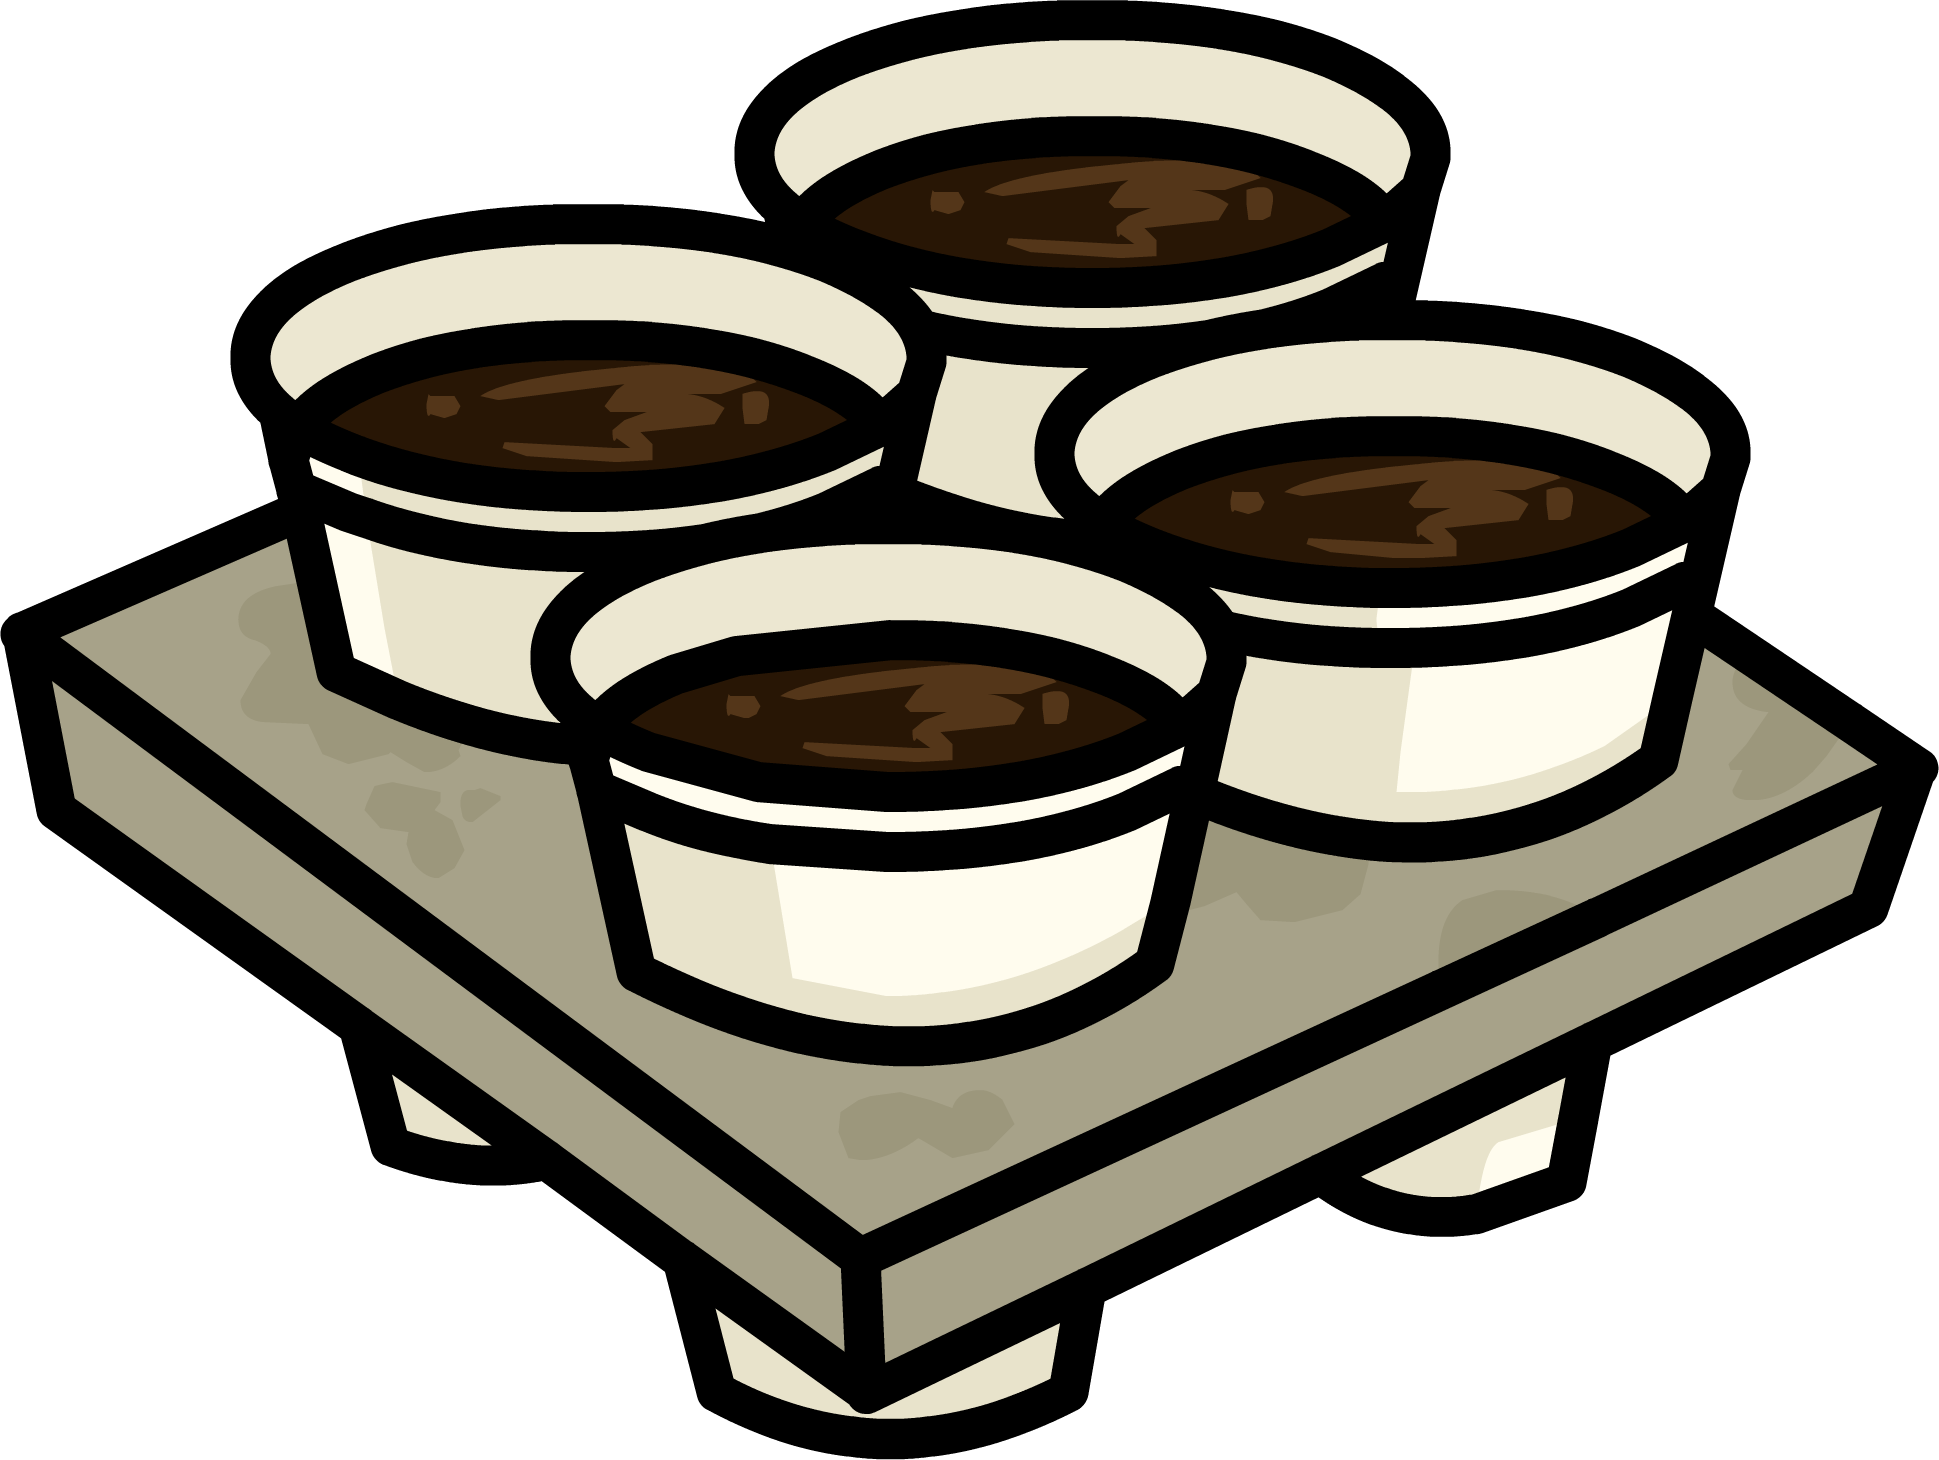 Bandeja de Café